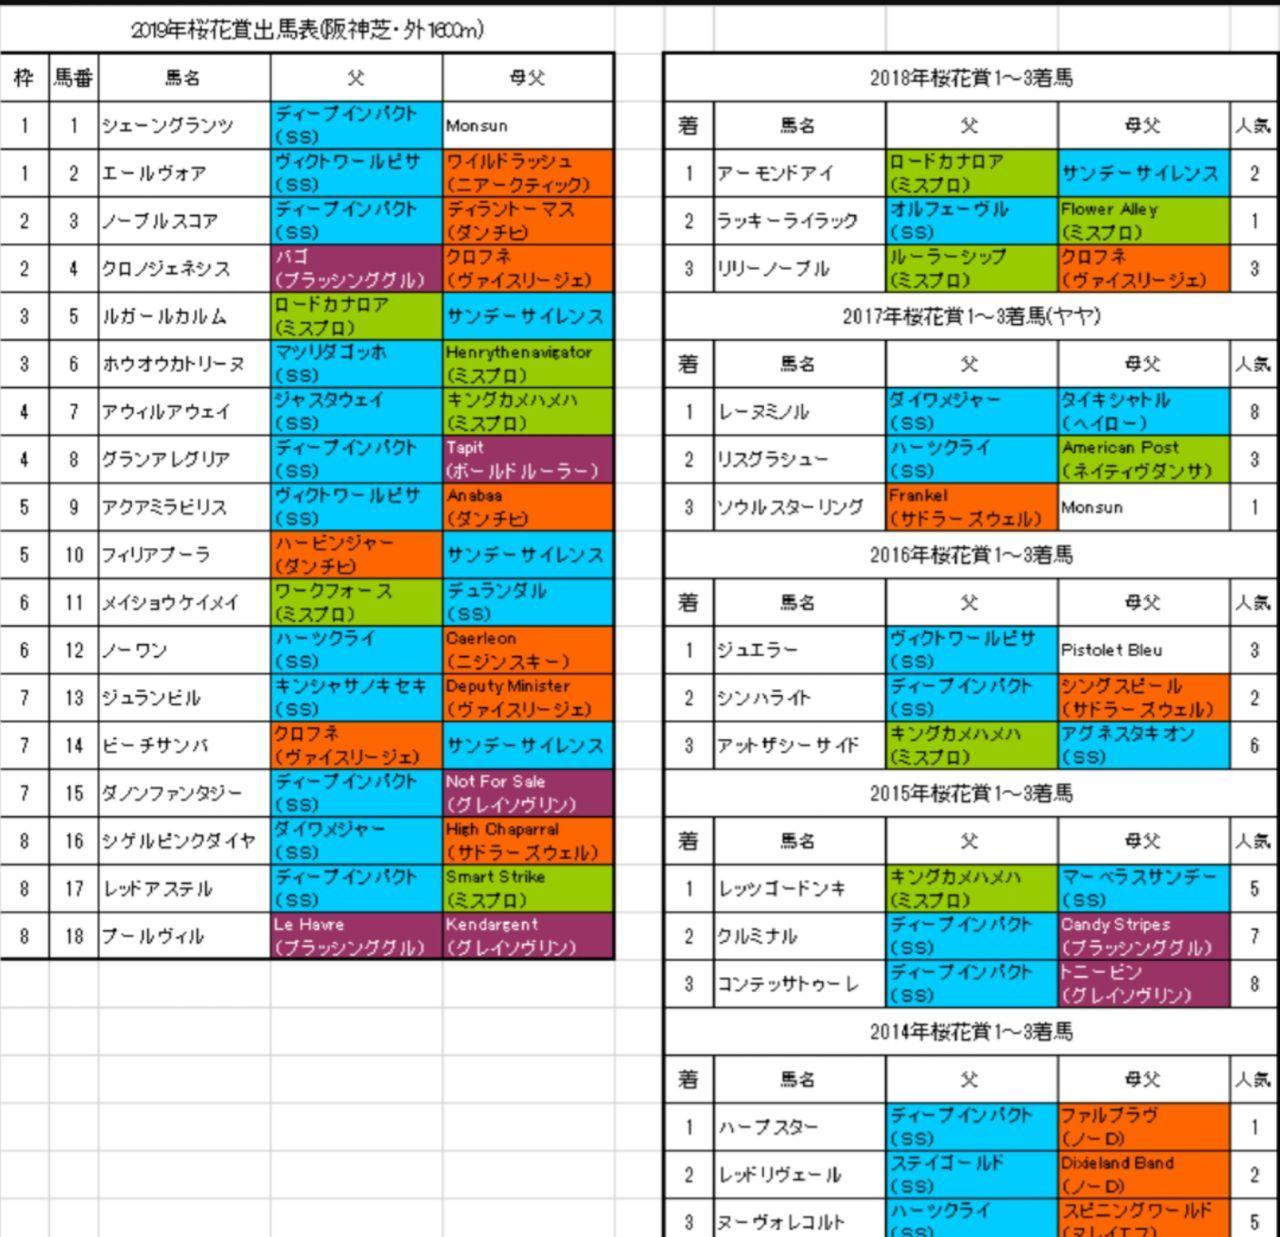 WYIG - JMグローバル・ホールディング 桜花賞 1 ,4, 5, 8, 14, 15 1武 内枠不利だけどなんかありそうだな  後はフサイチ